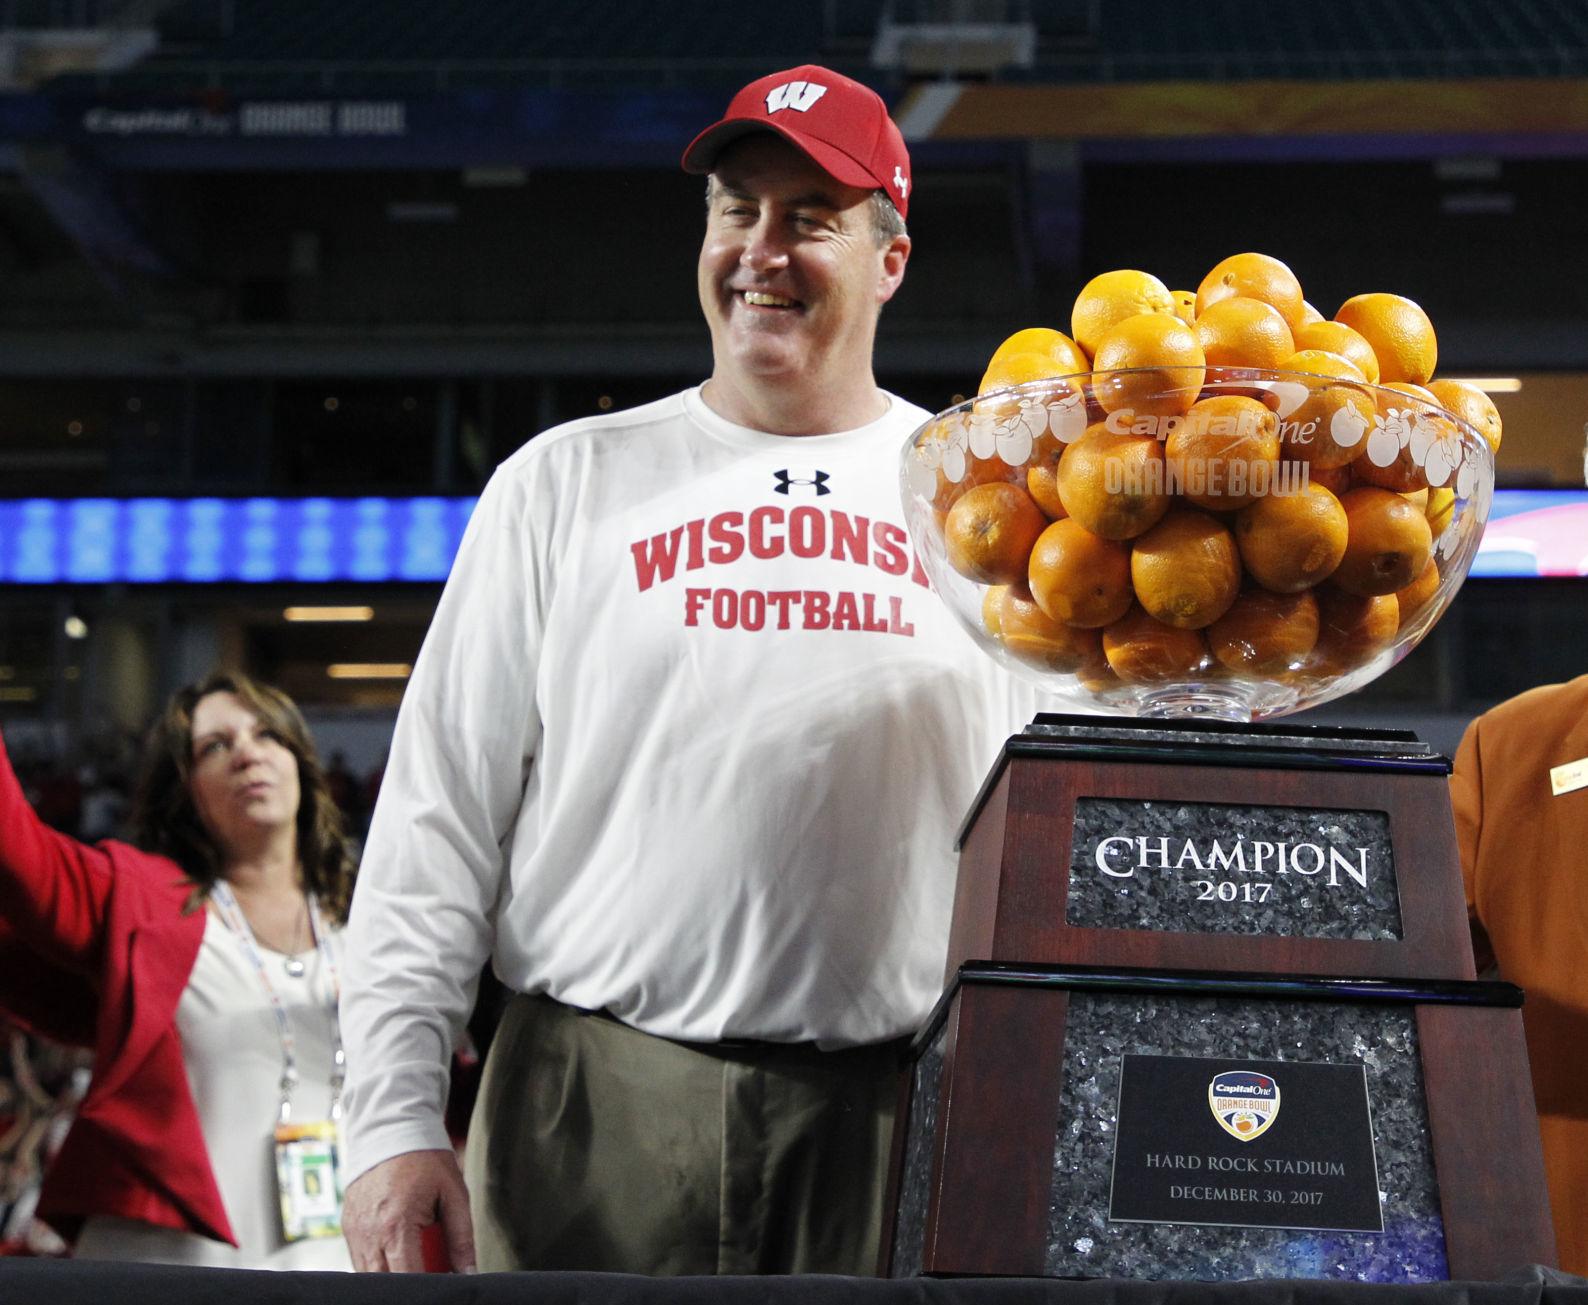 Paul Chryst, Orange Bowl trophy, AP photo